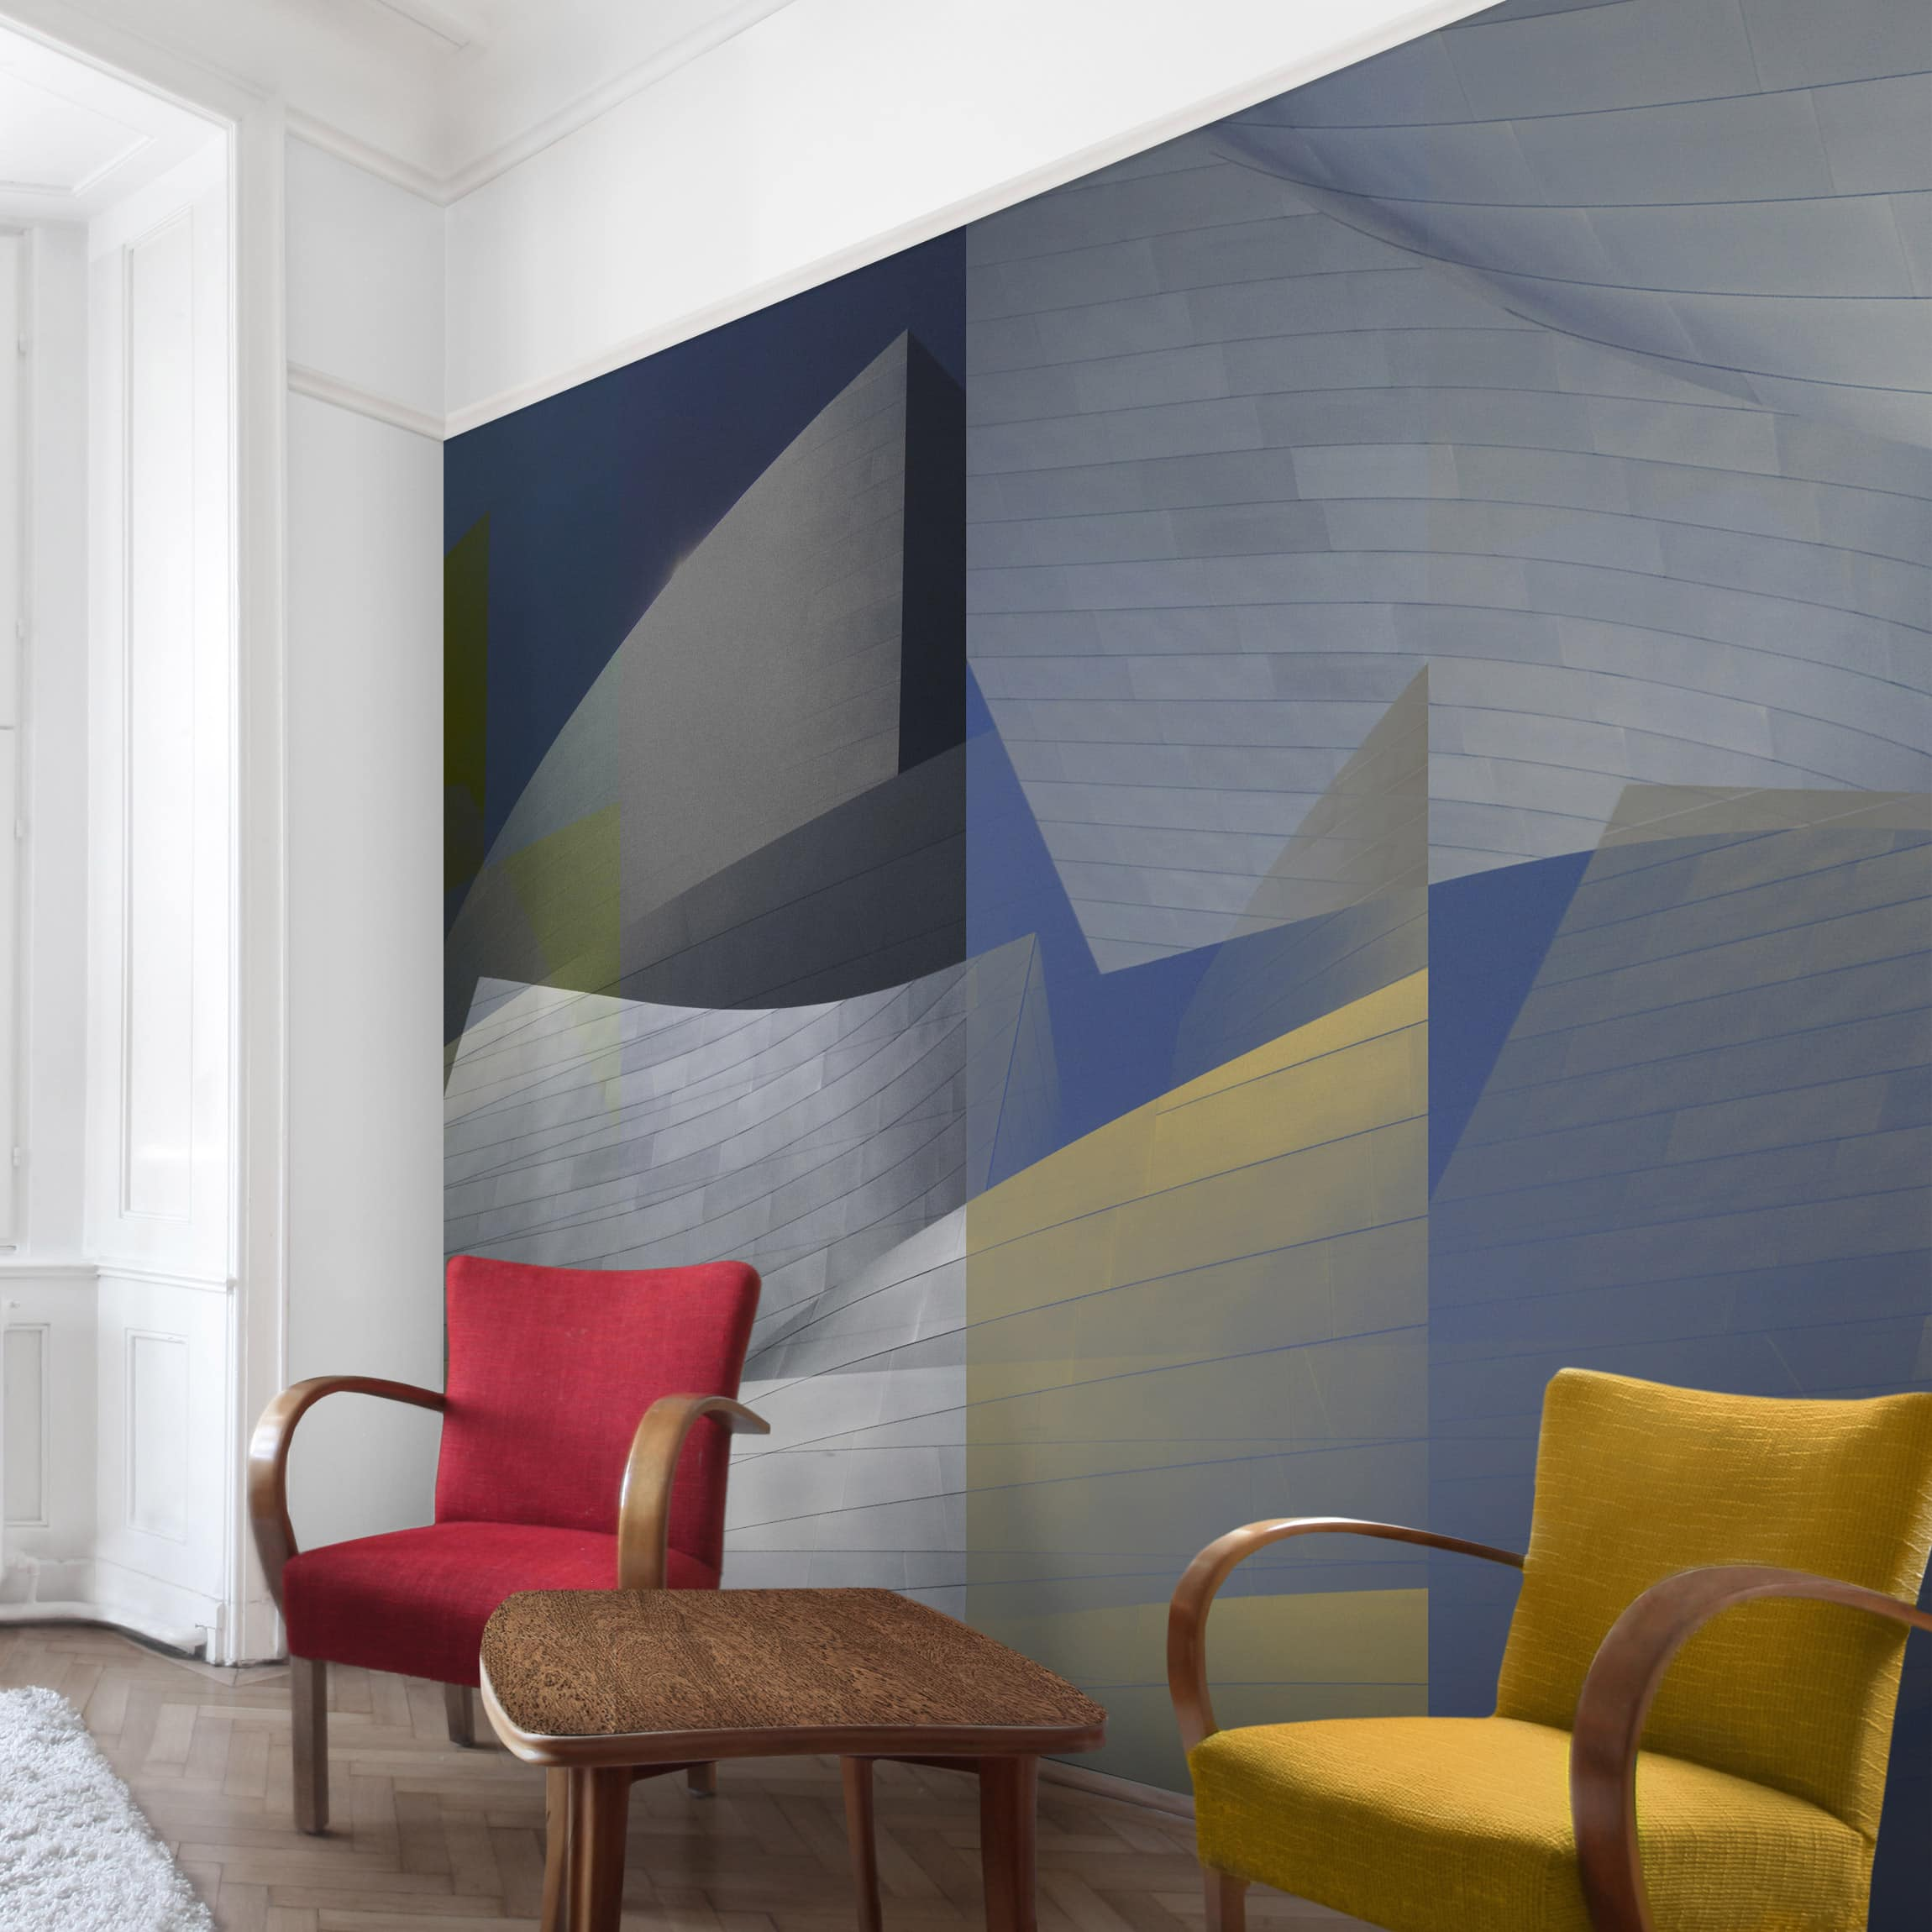 tapete selbstklebend geary 3 wandbild quadratisch. Black Bedroom Furniture Sets. Home Design Ideas